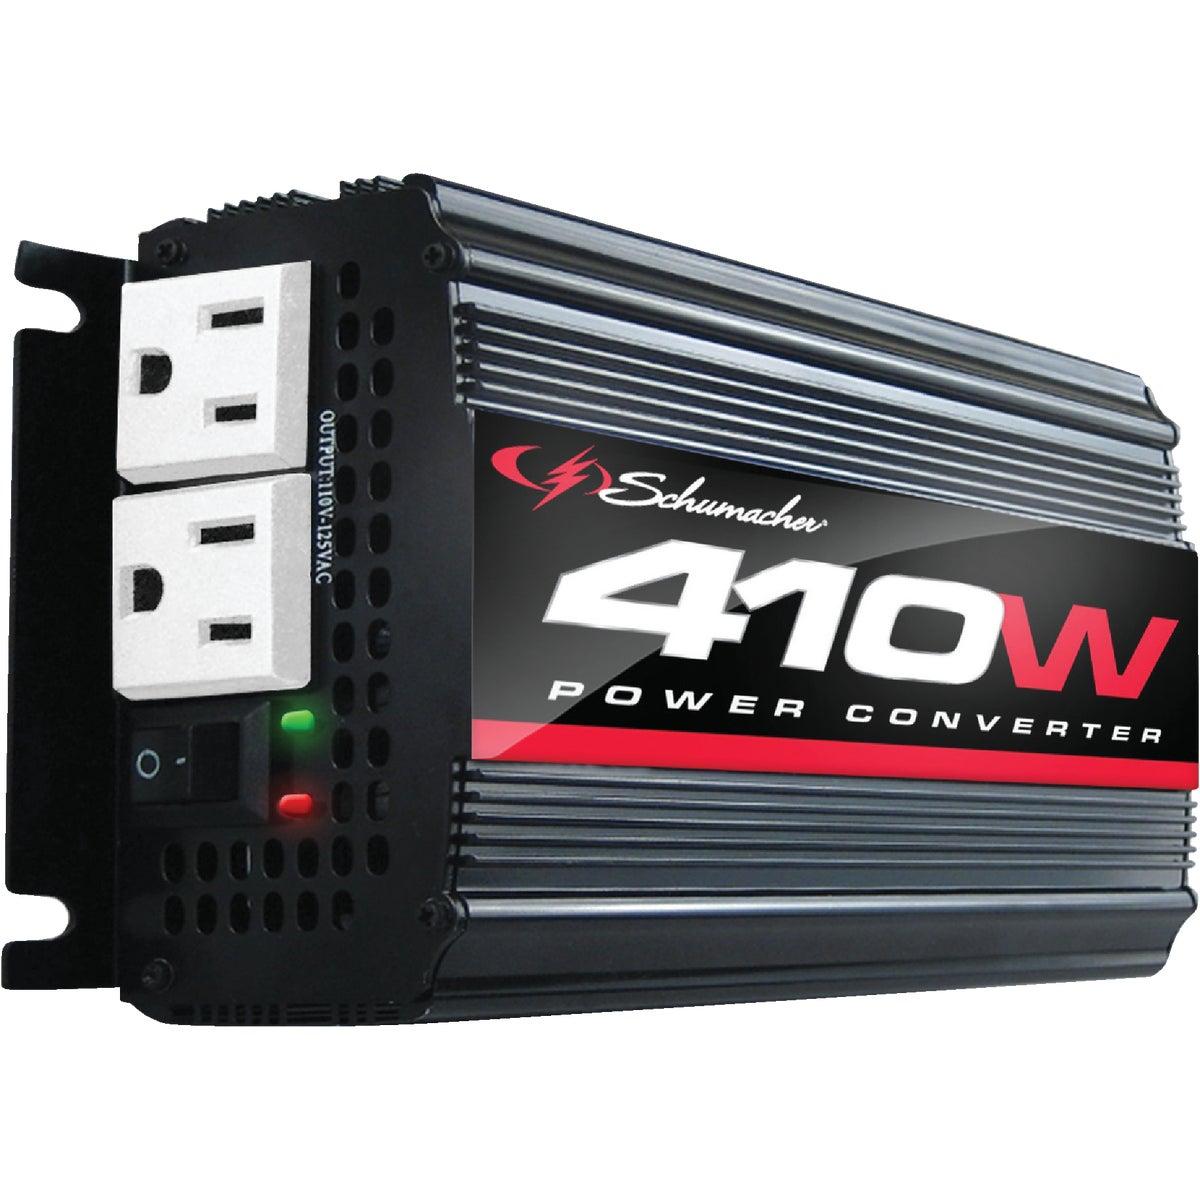 410W Power Inverter